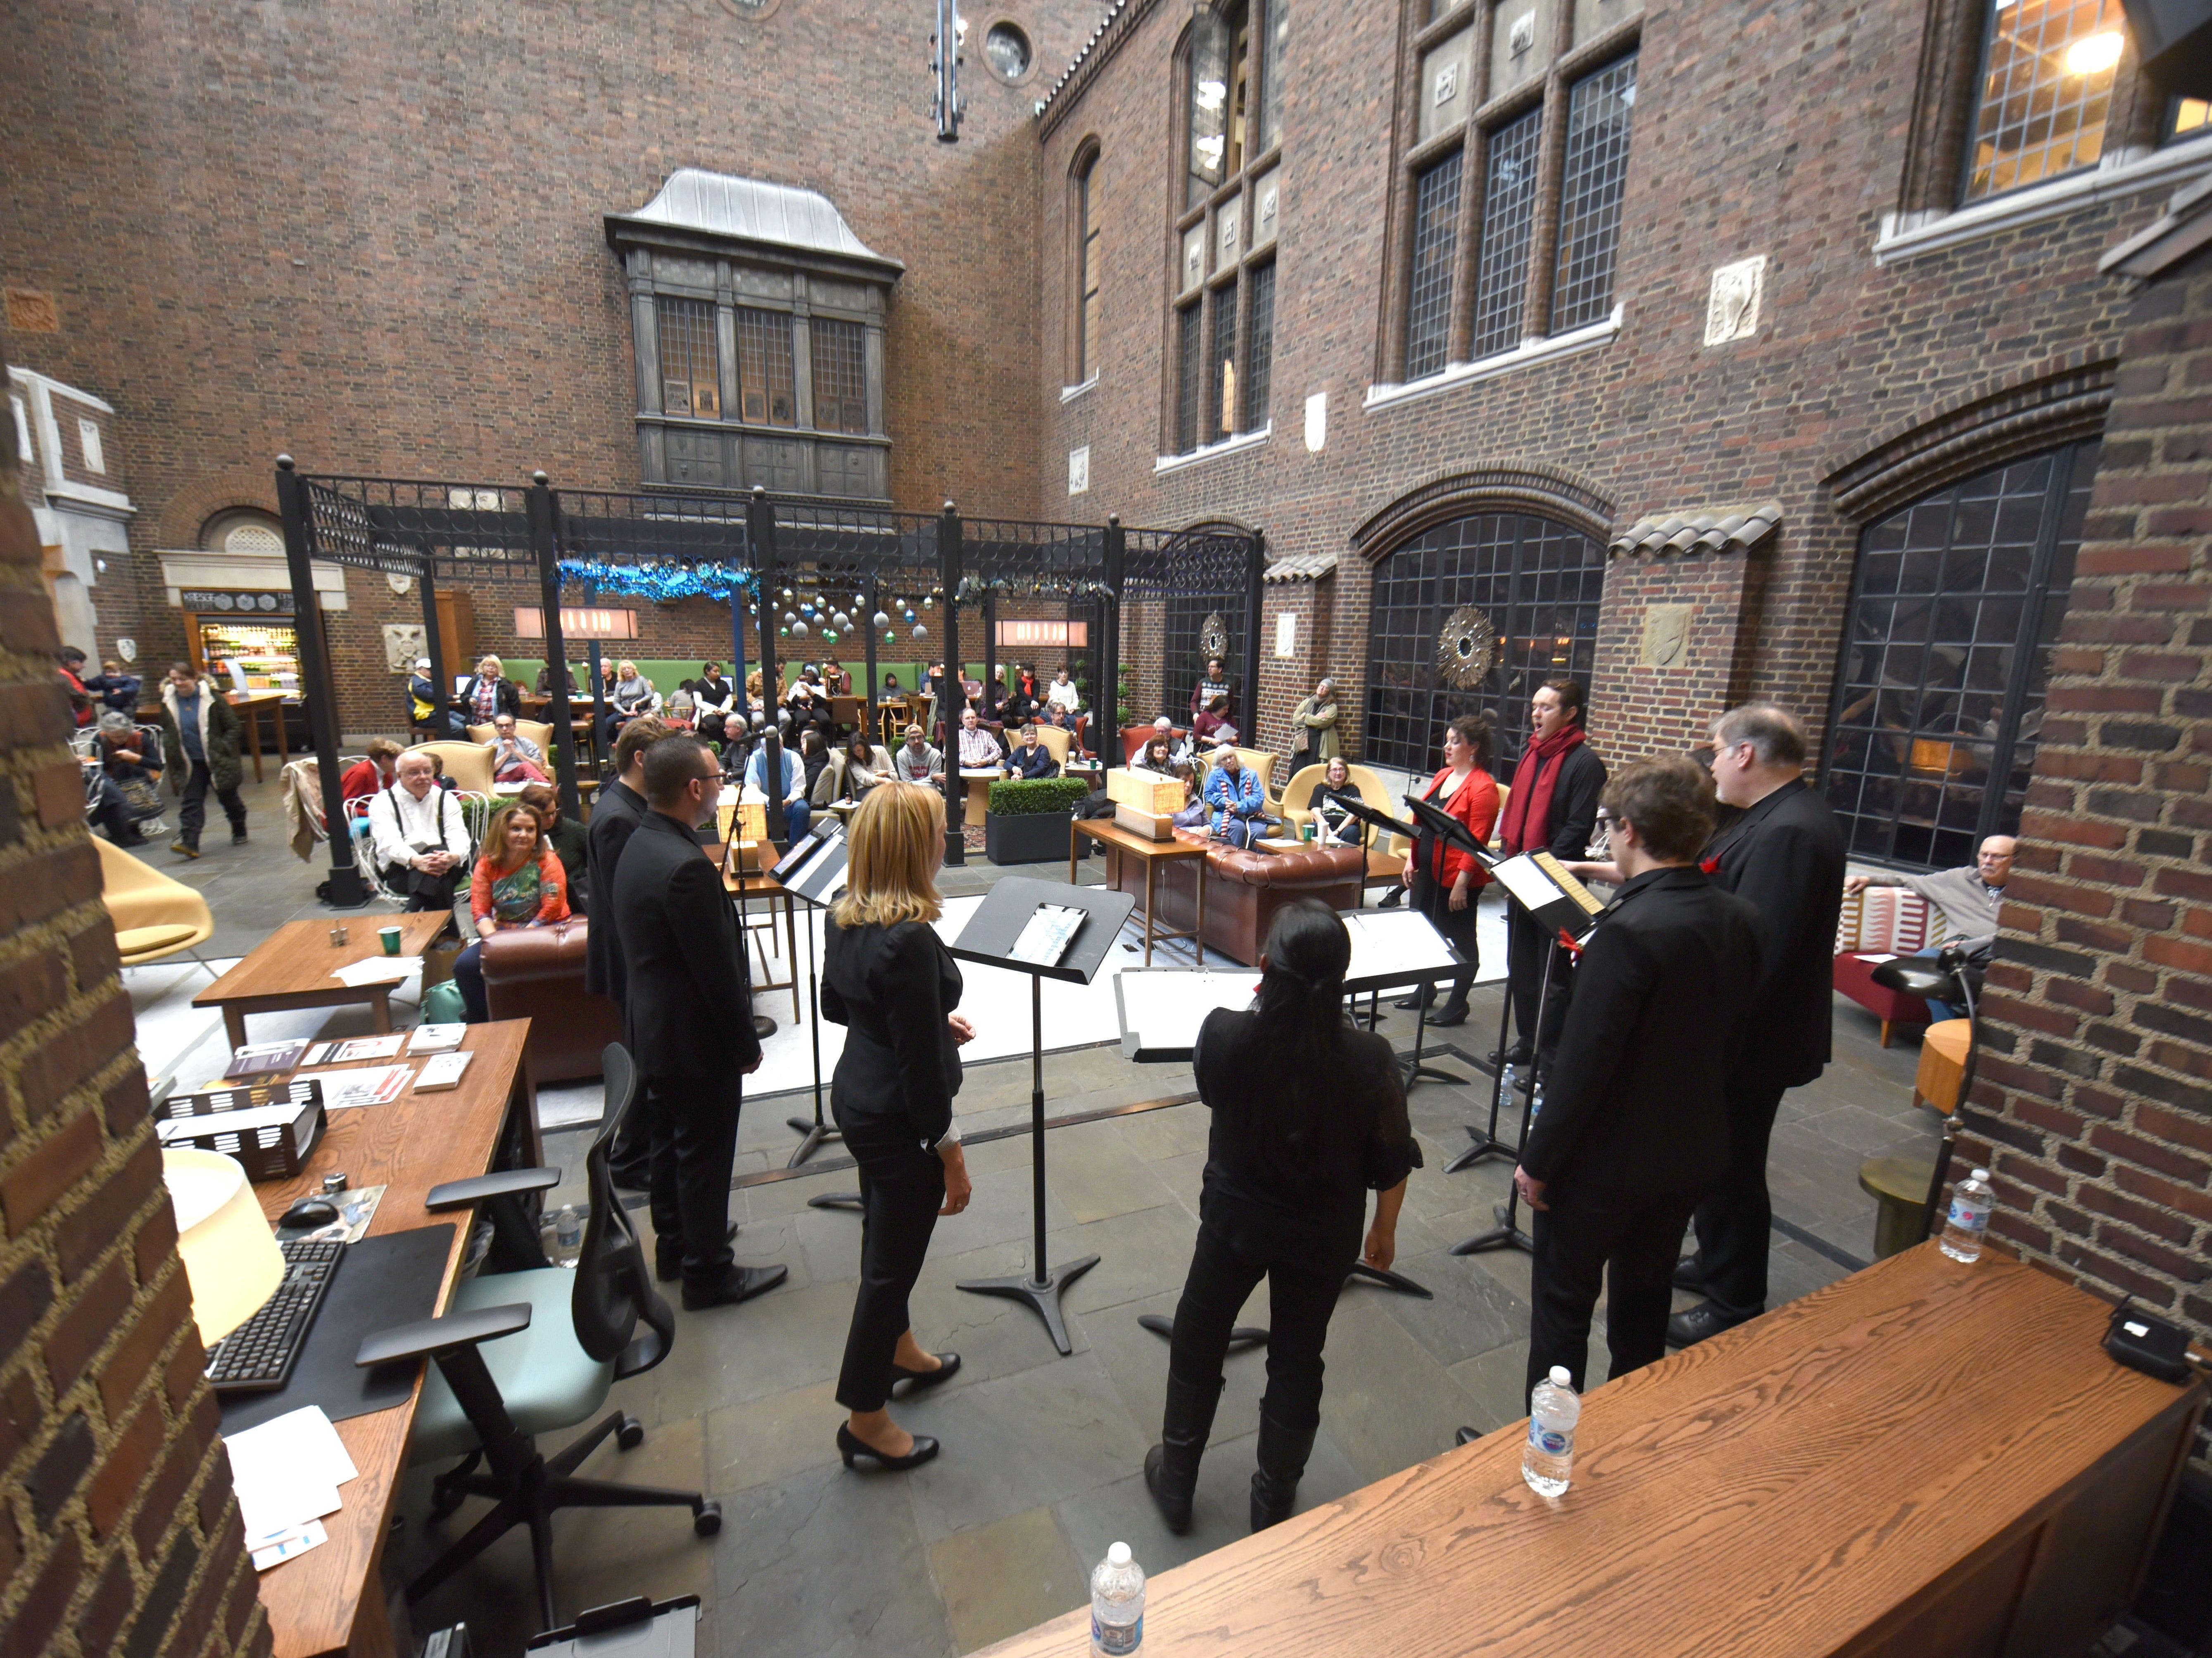 The vocal ensemble Audivi perform at Kresge Court inside the Detroit Institute of Art during Noel Night in Detroit on Saturday, December 1, 2018.